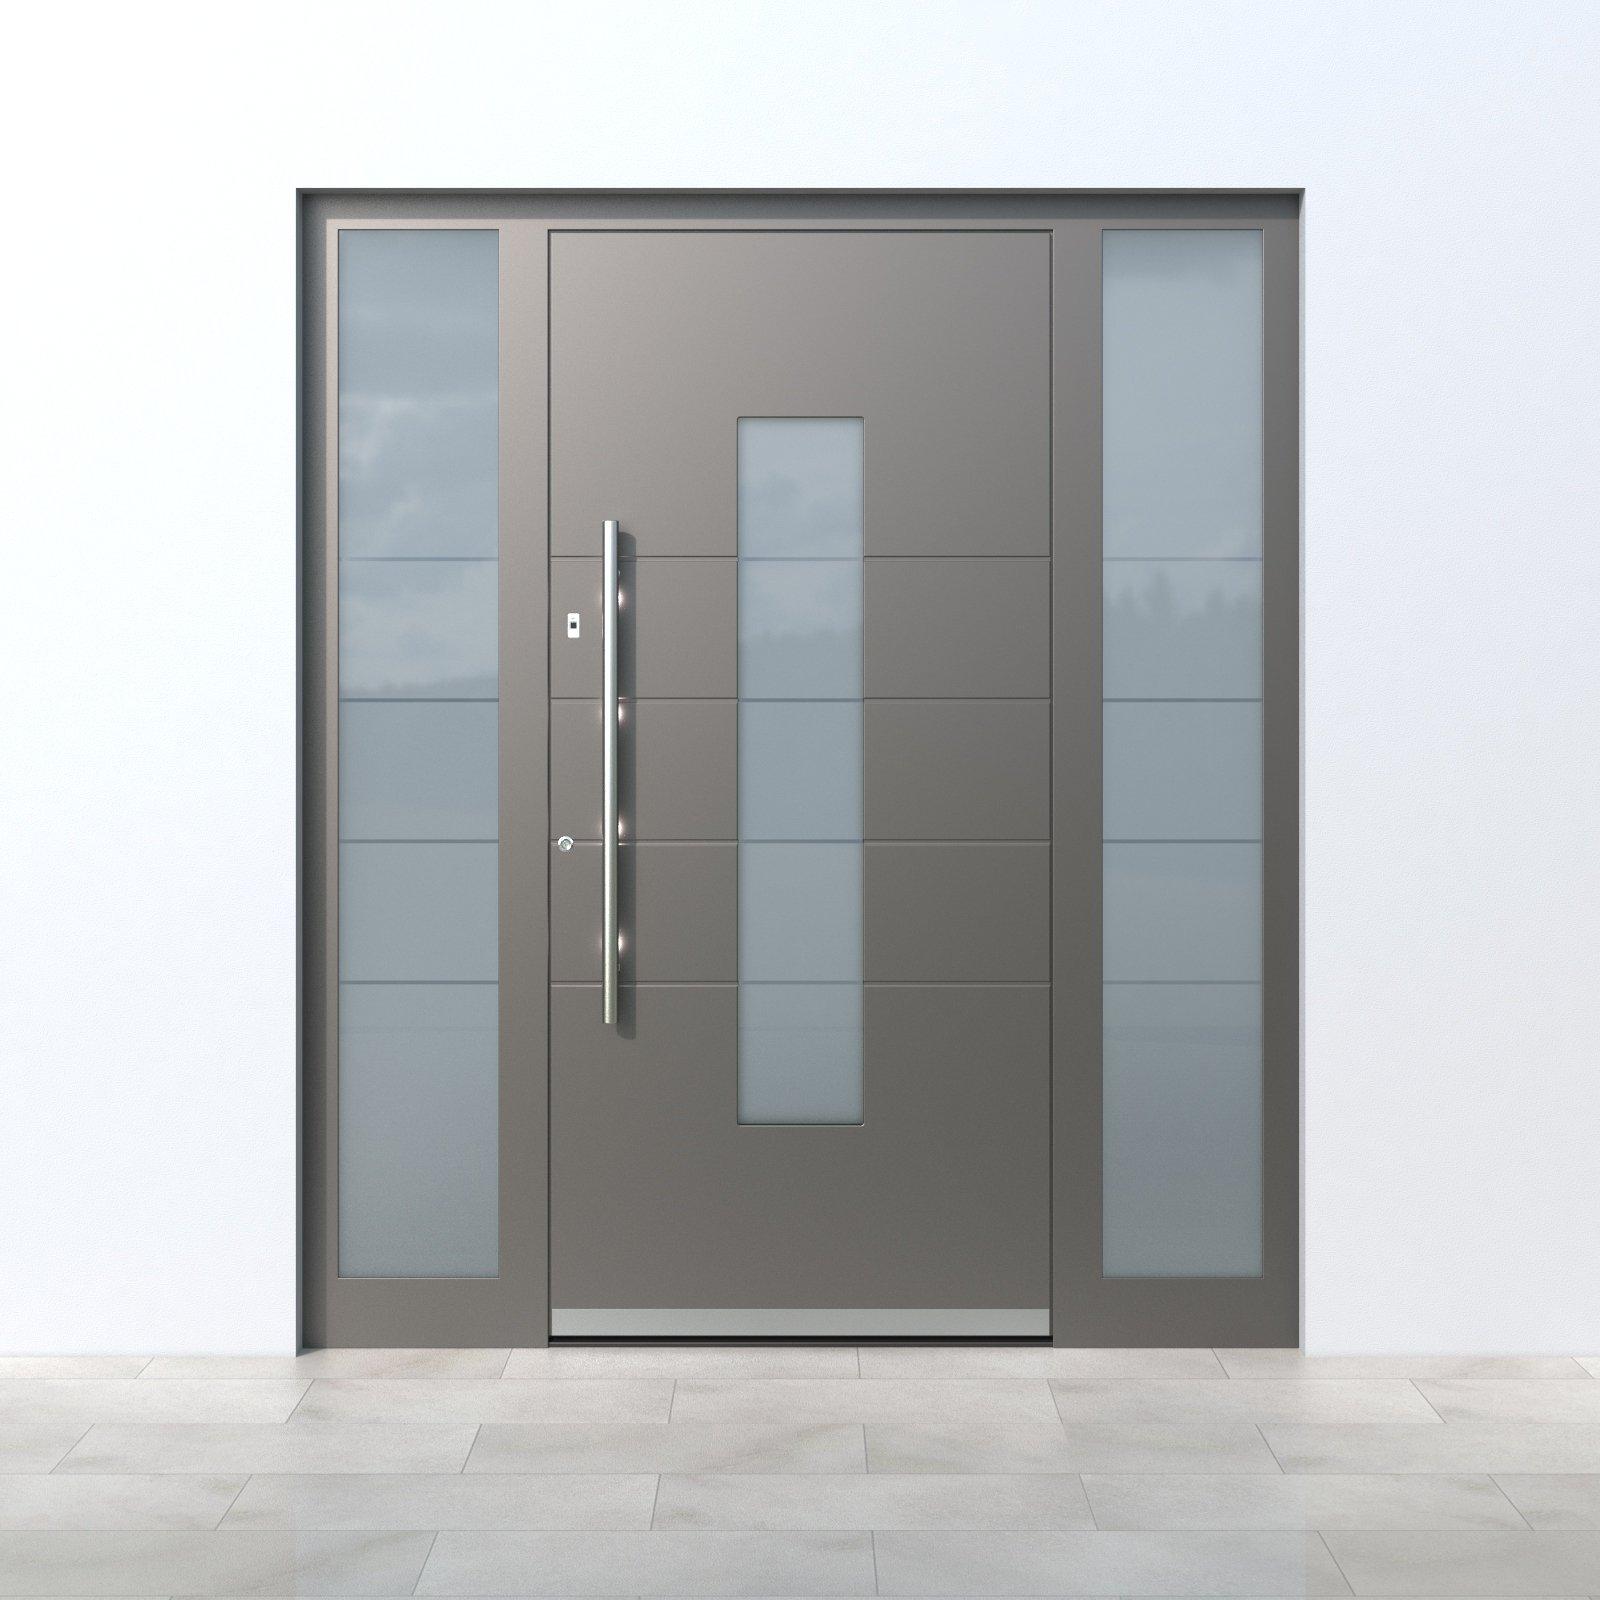 Pirnar_Quantum_QB50 Haustüren